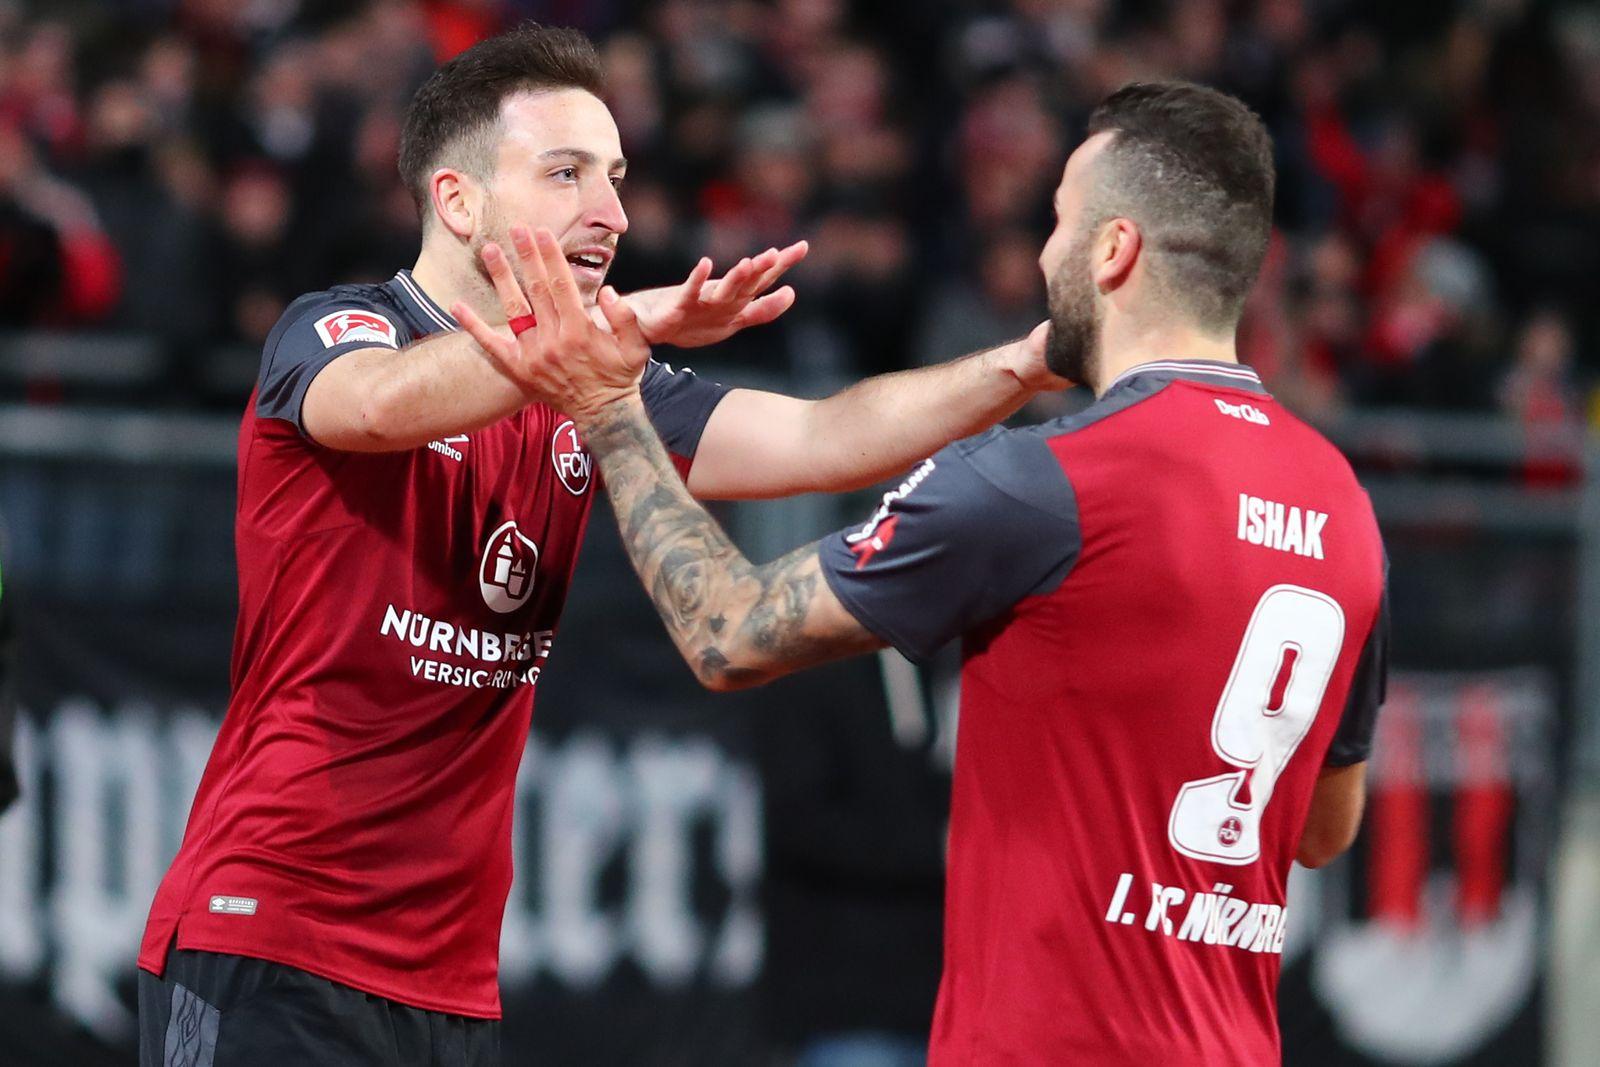 1. FC Nürnberg - Erzgebirge Aue